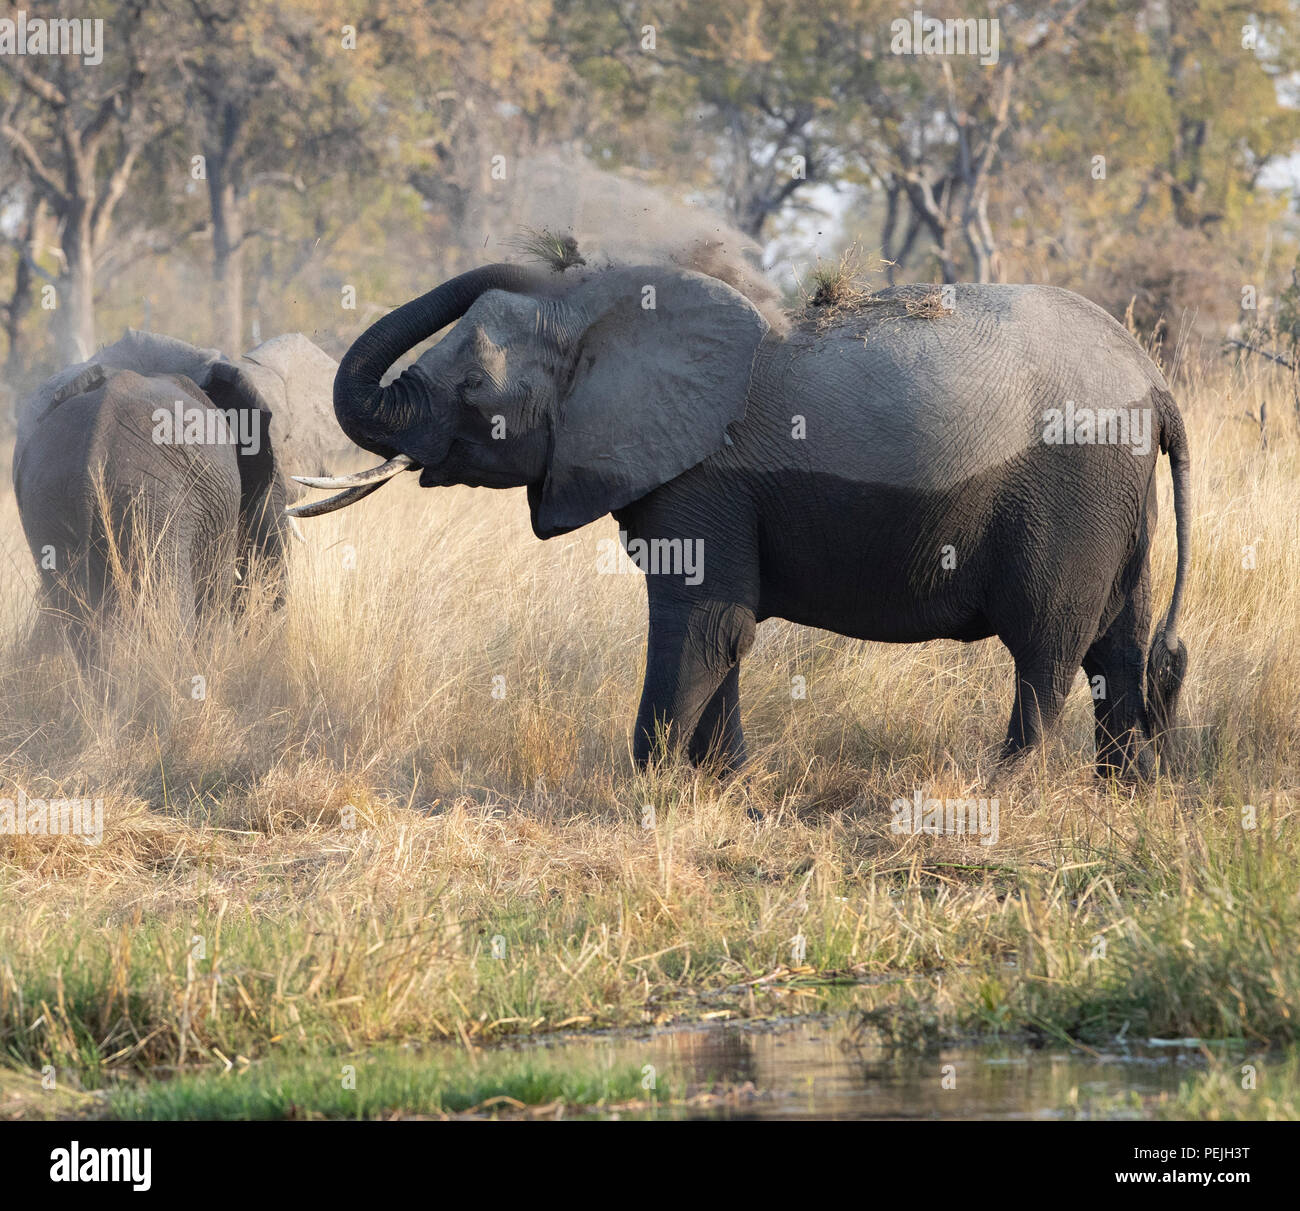 African elephant throws dirt over its back, Okavango Delta, Botswana - Stock Image